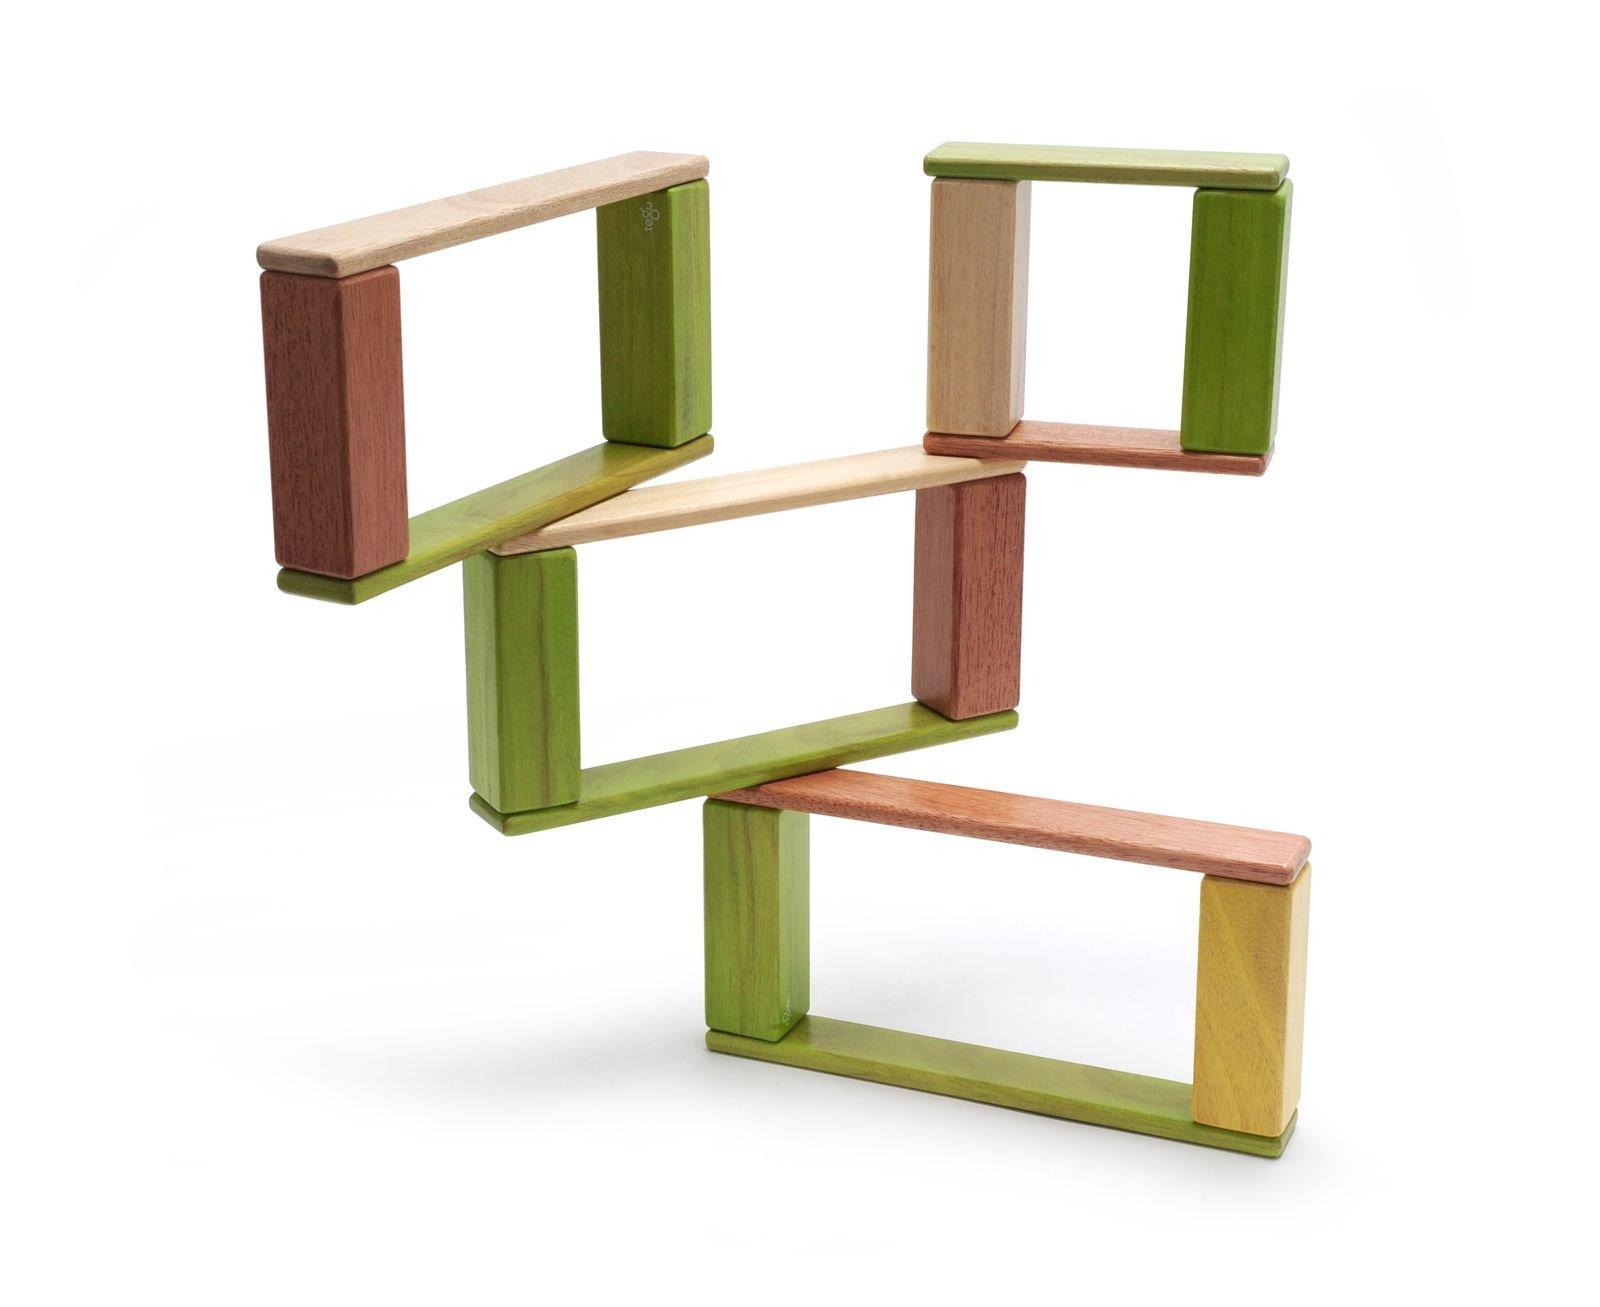 22 Piece Tegu Endeavor Magnetic Wooden Block Set, Jungle by Tegu (Image #2)